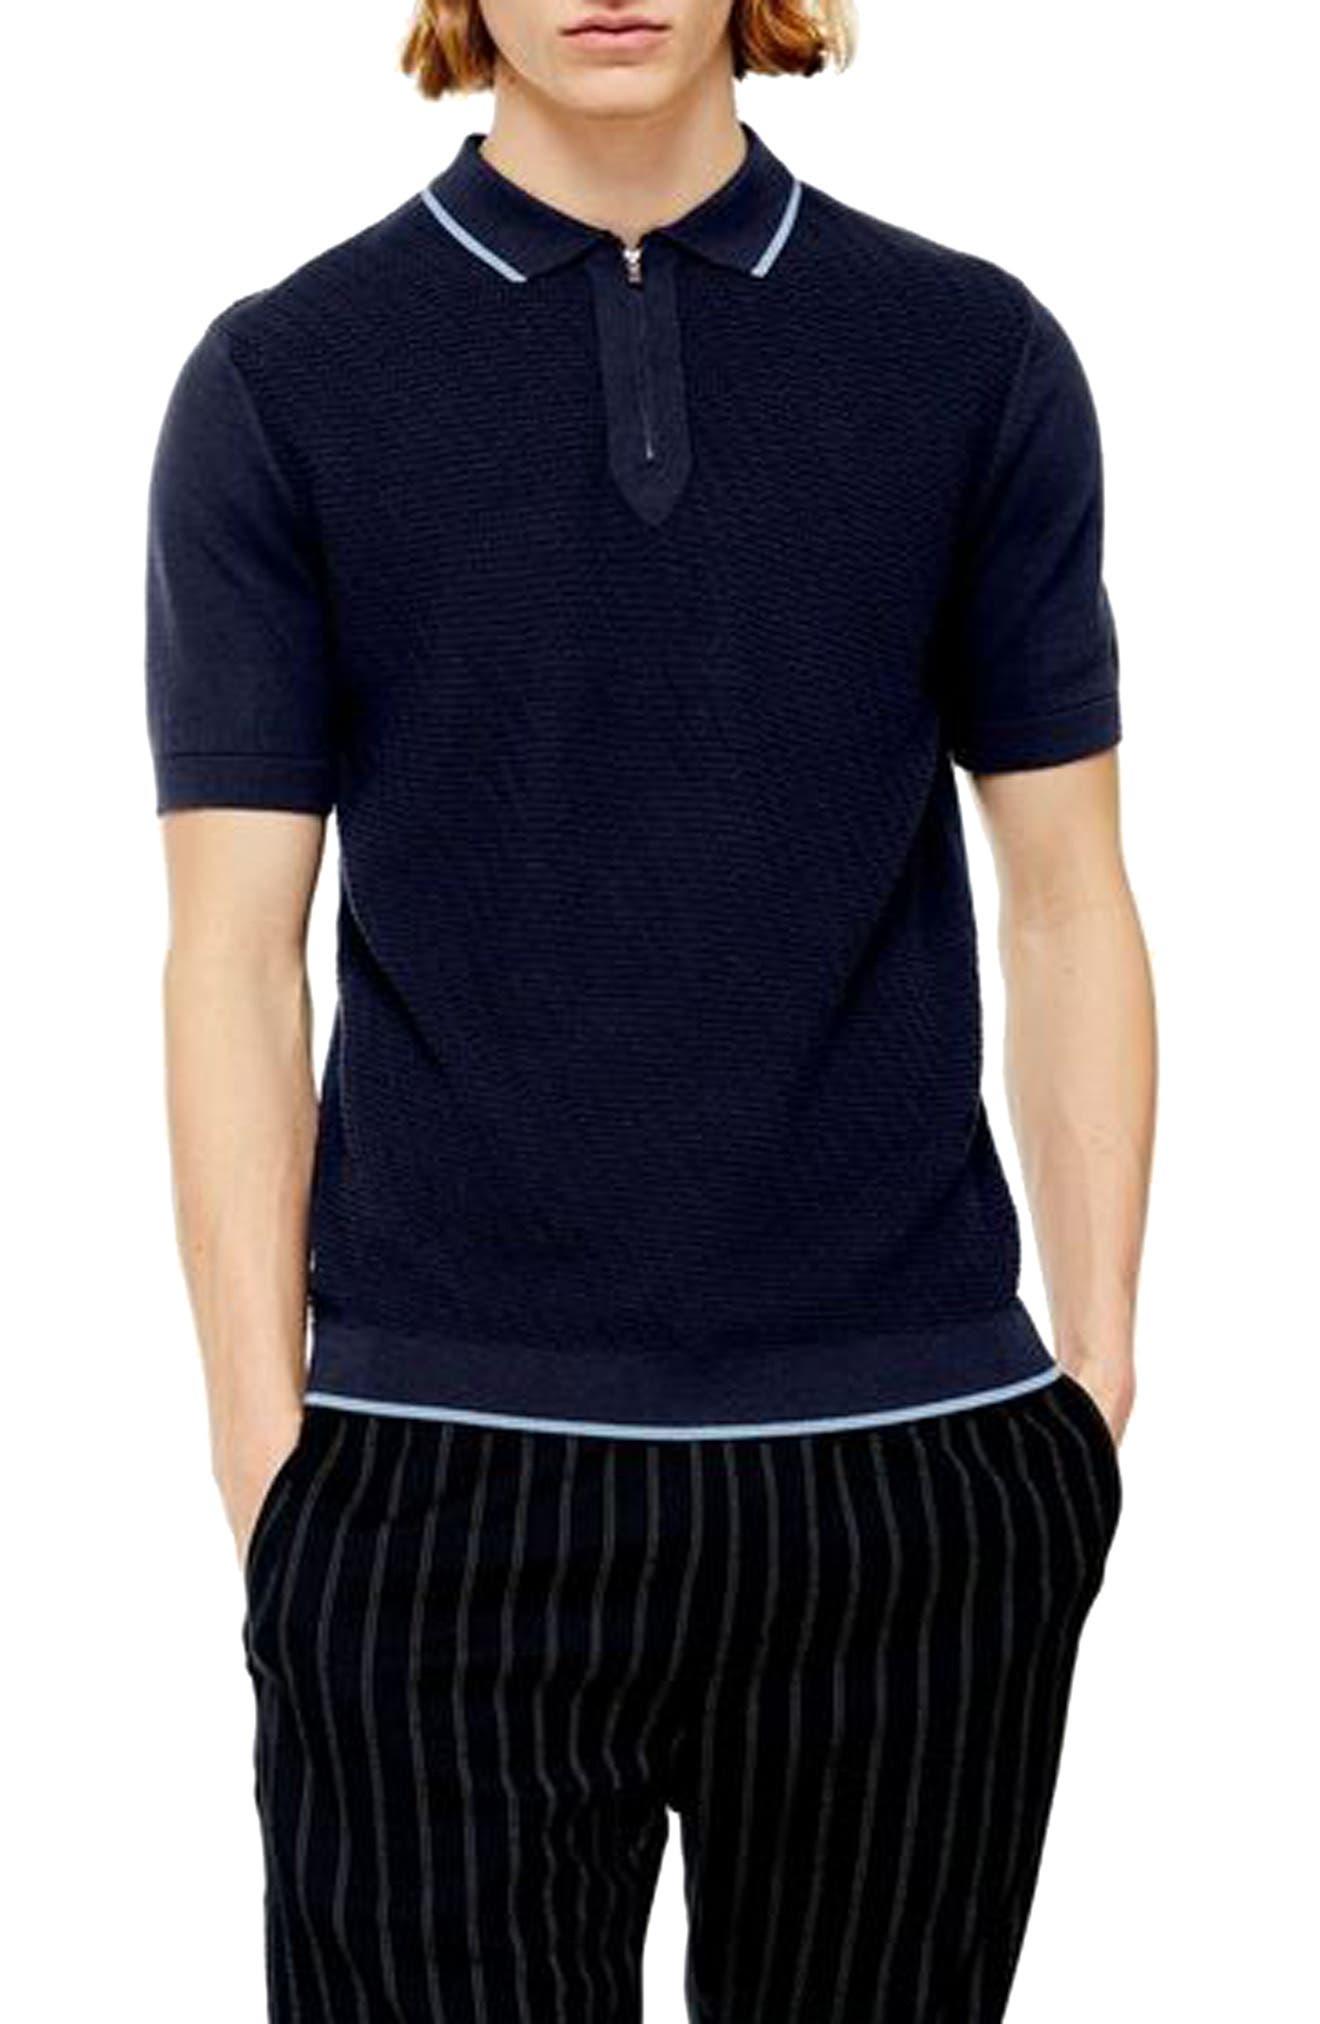 1960s -1970s Men's Clothing Mens Topman Trim Fit Zip Sweater Polo $22.50 AT vintagedancer.com